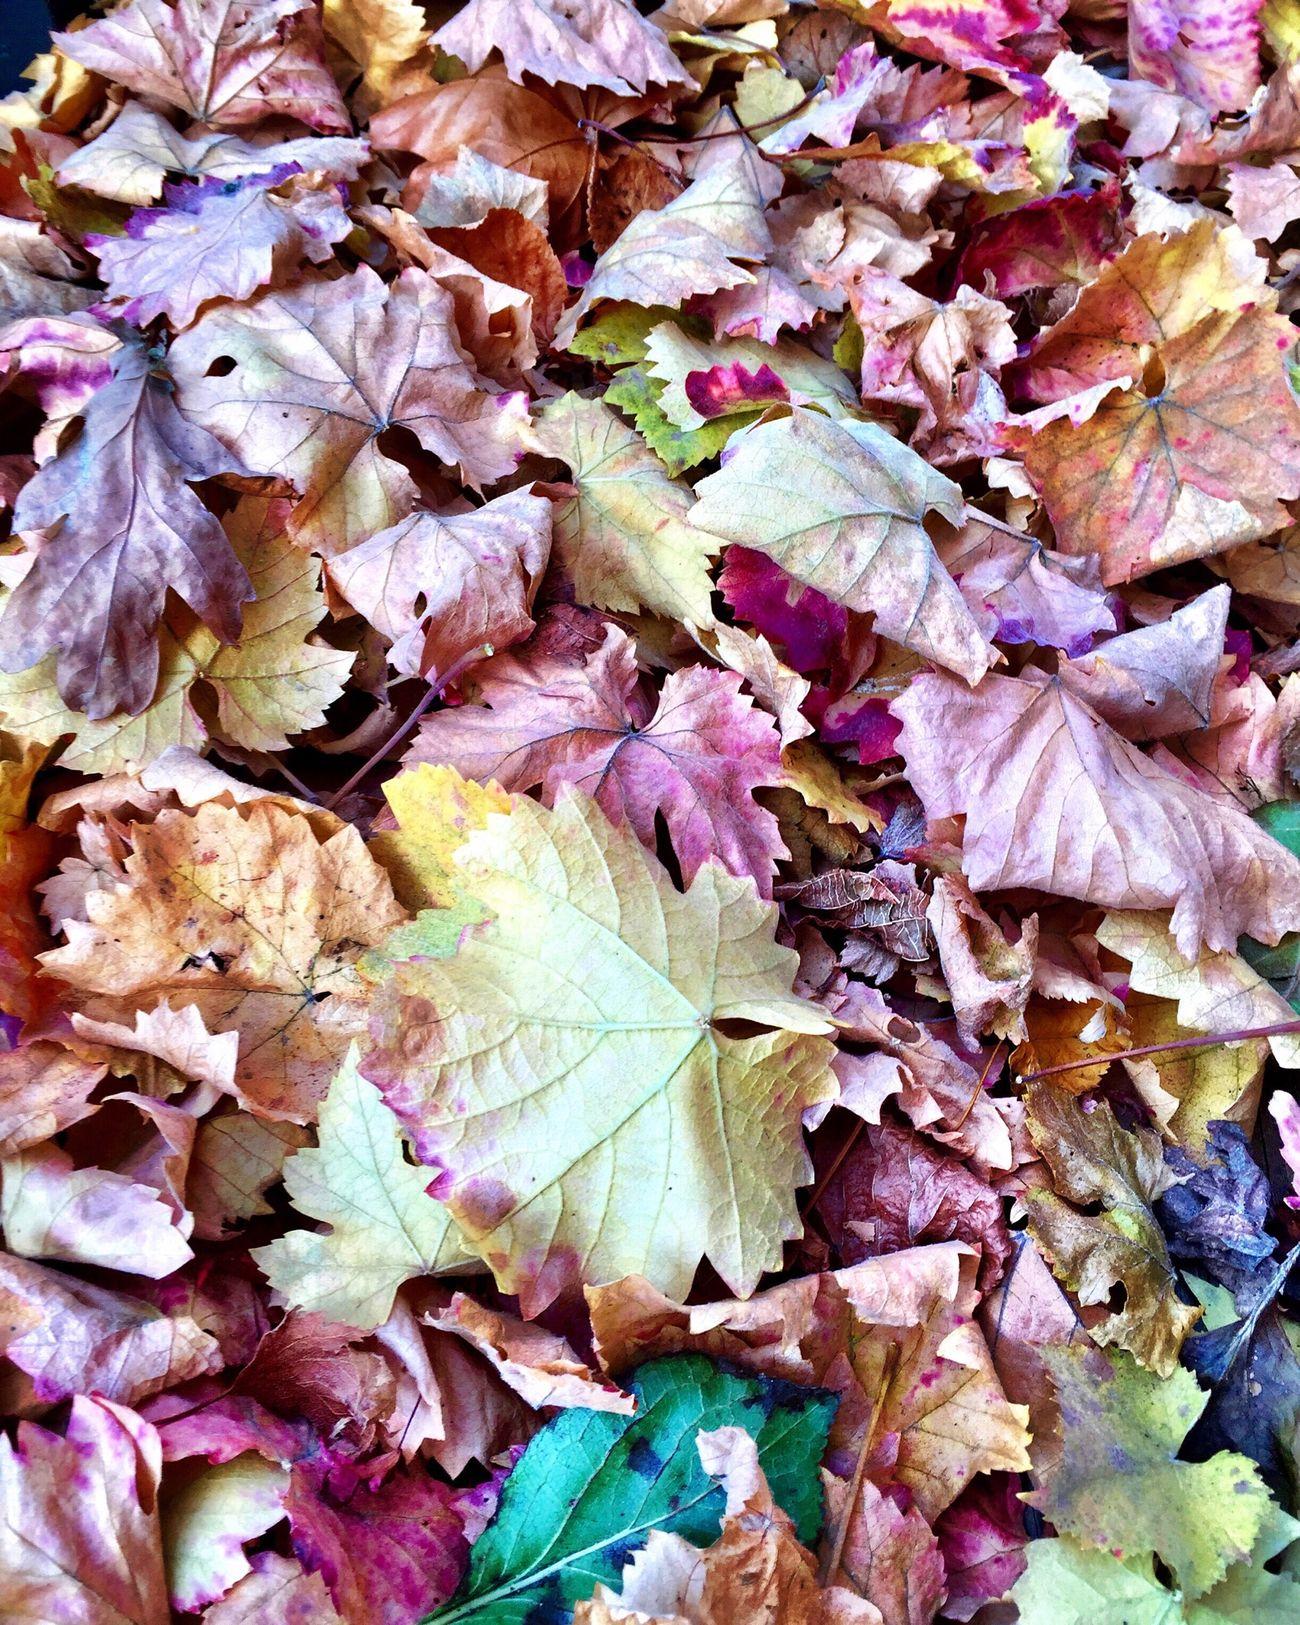 Autumn leaves Eye4photography  EyeEm Best Shots The Week On Eyem Eye4delight EyeEm Nature Lover Nature_collection EyeEm Gallery Autumn Colors Nature